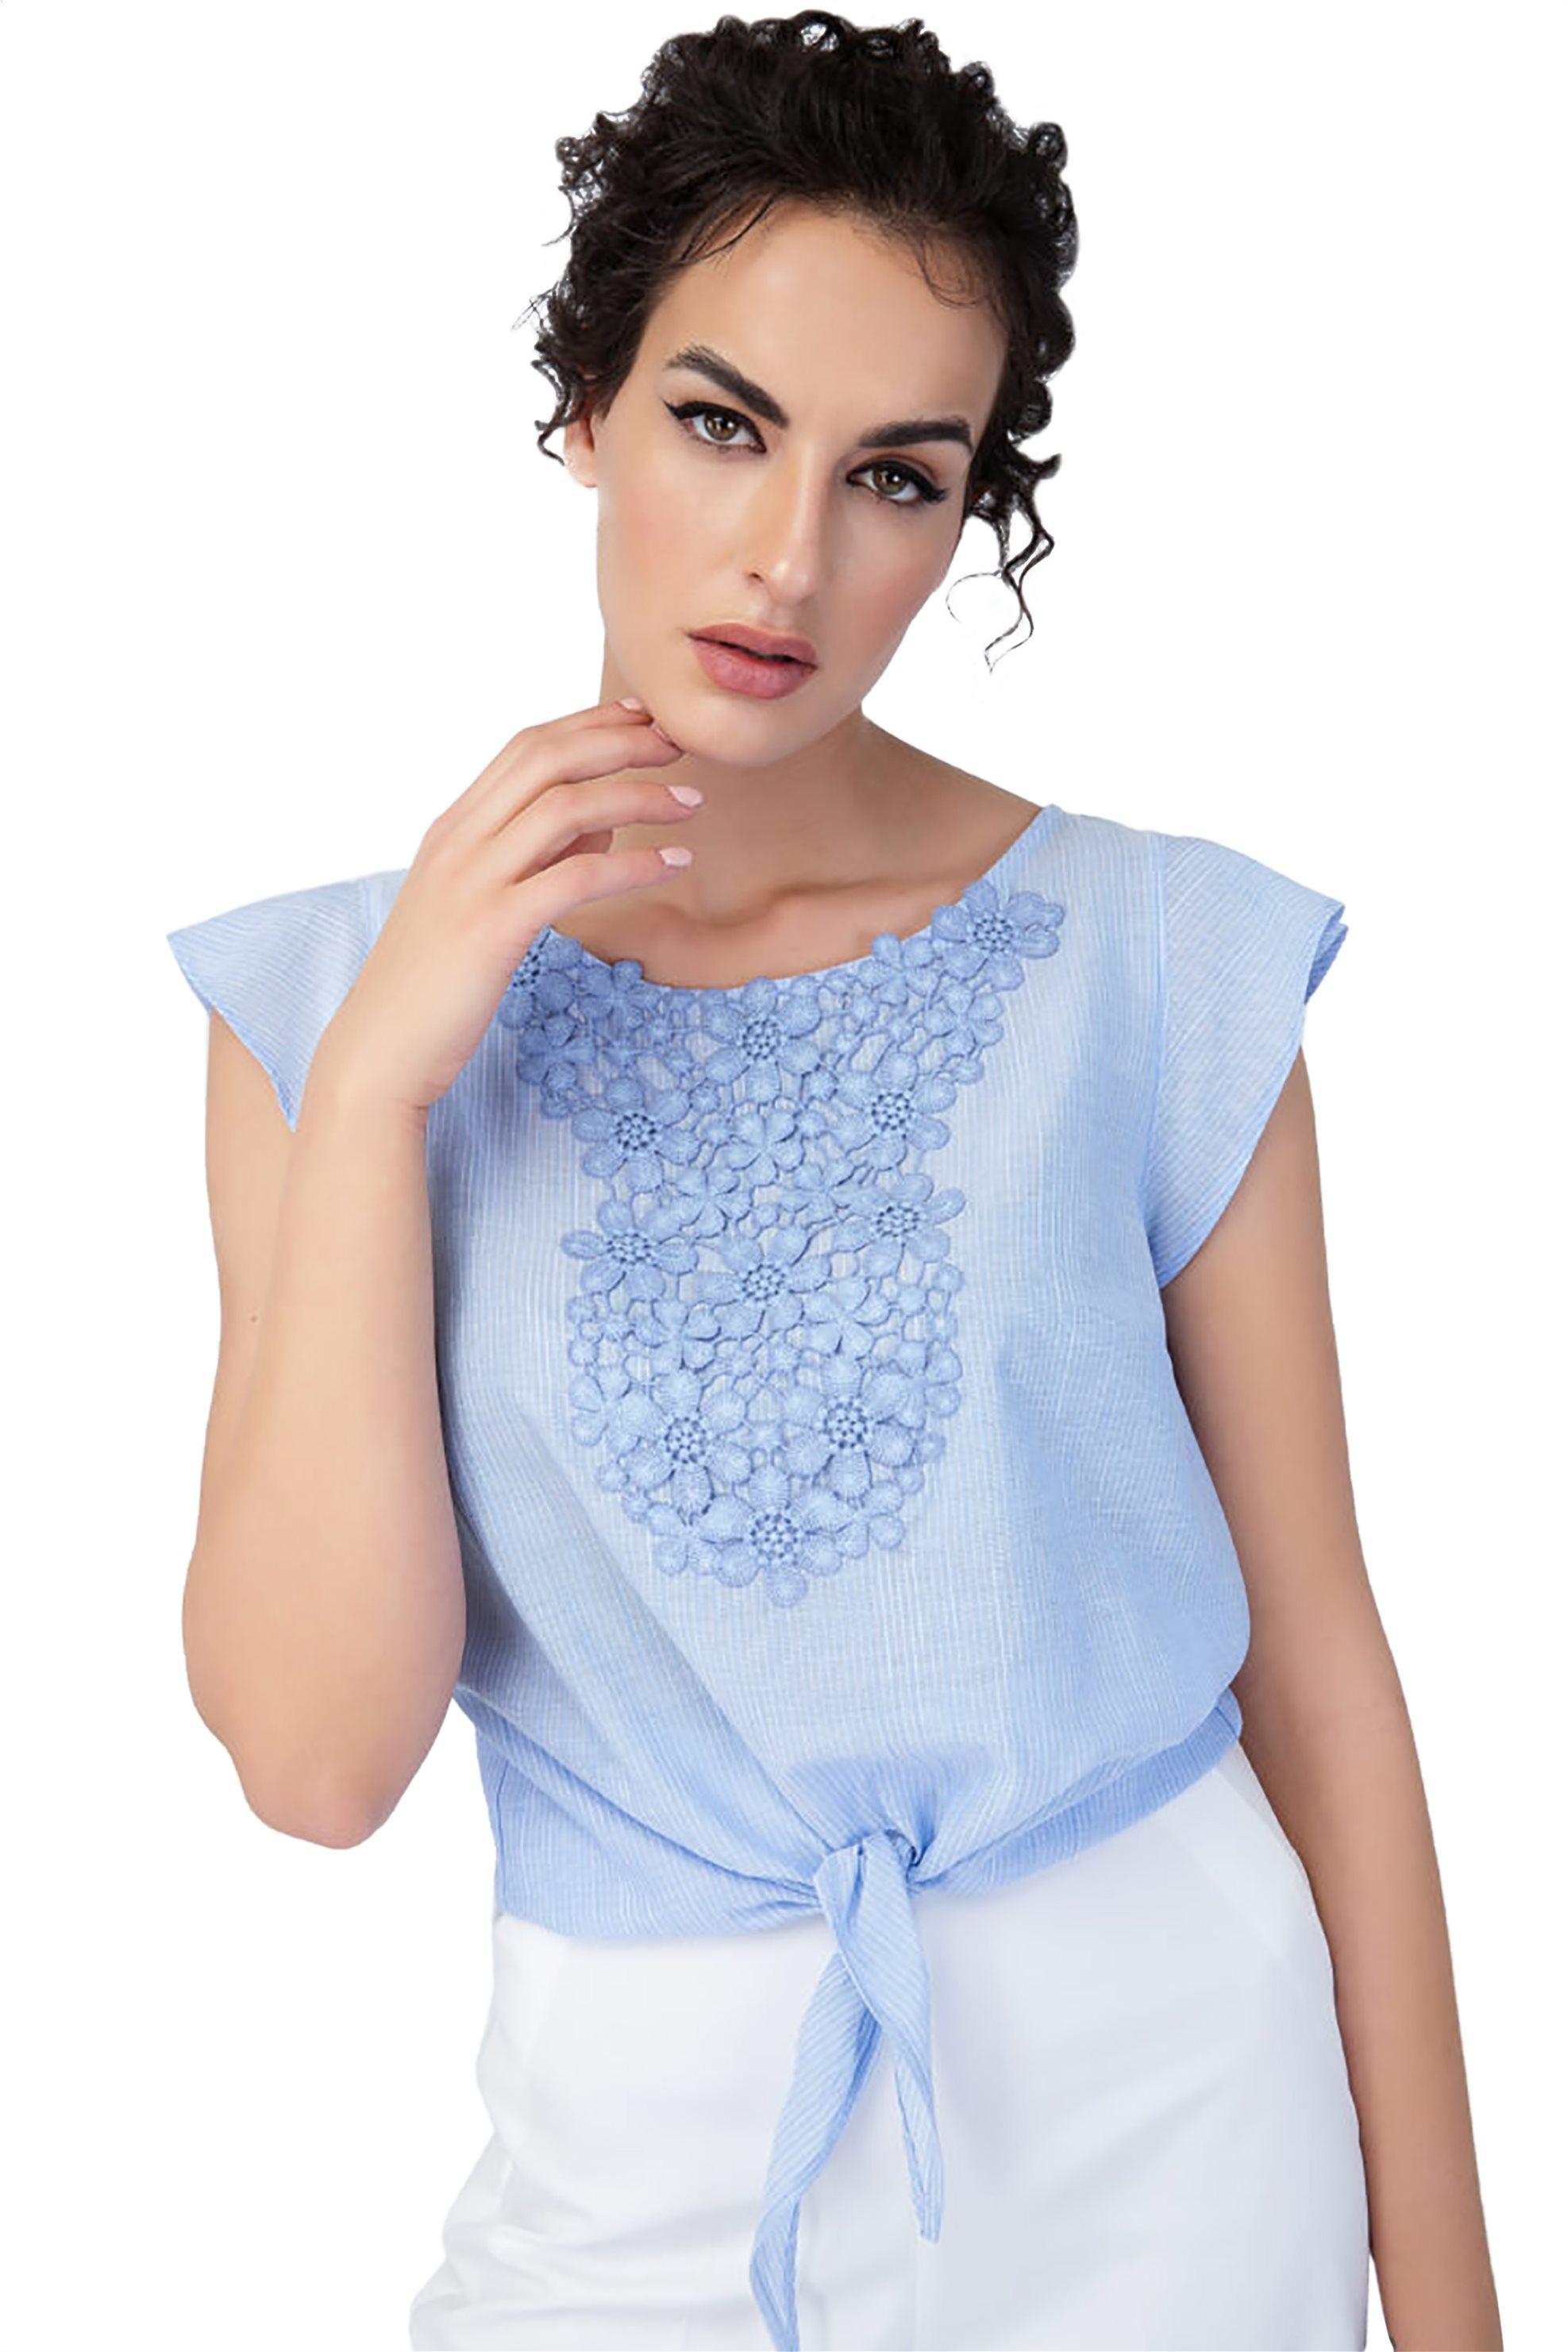 Billy Sabbado γυναικεία μπλούζα με απλικέ δαντέλα - 0235239112 - Γαλάζιο γυναικα   ρουχα   tops   μπλούζες   casual